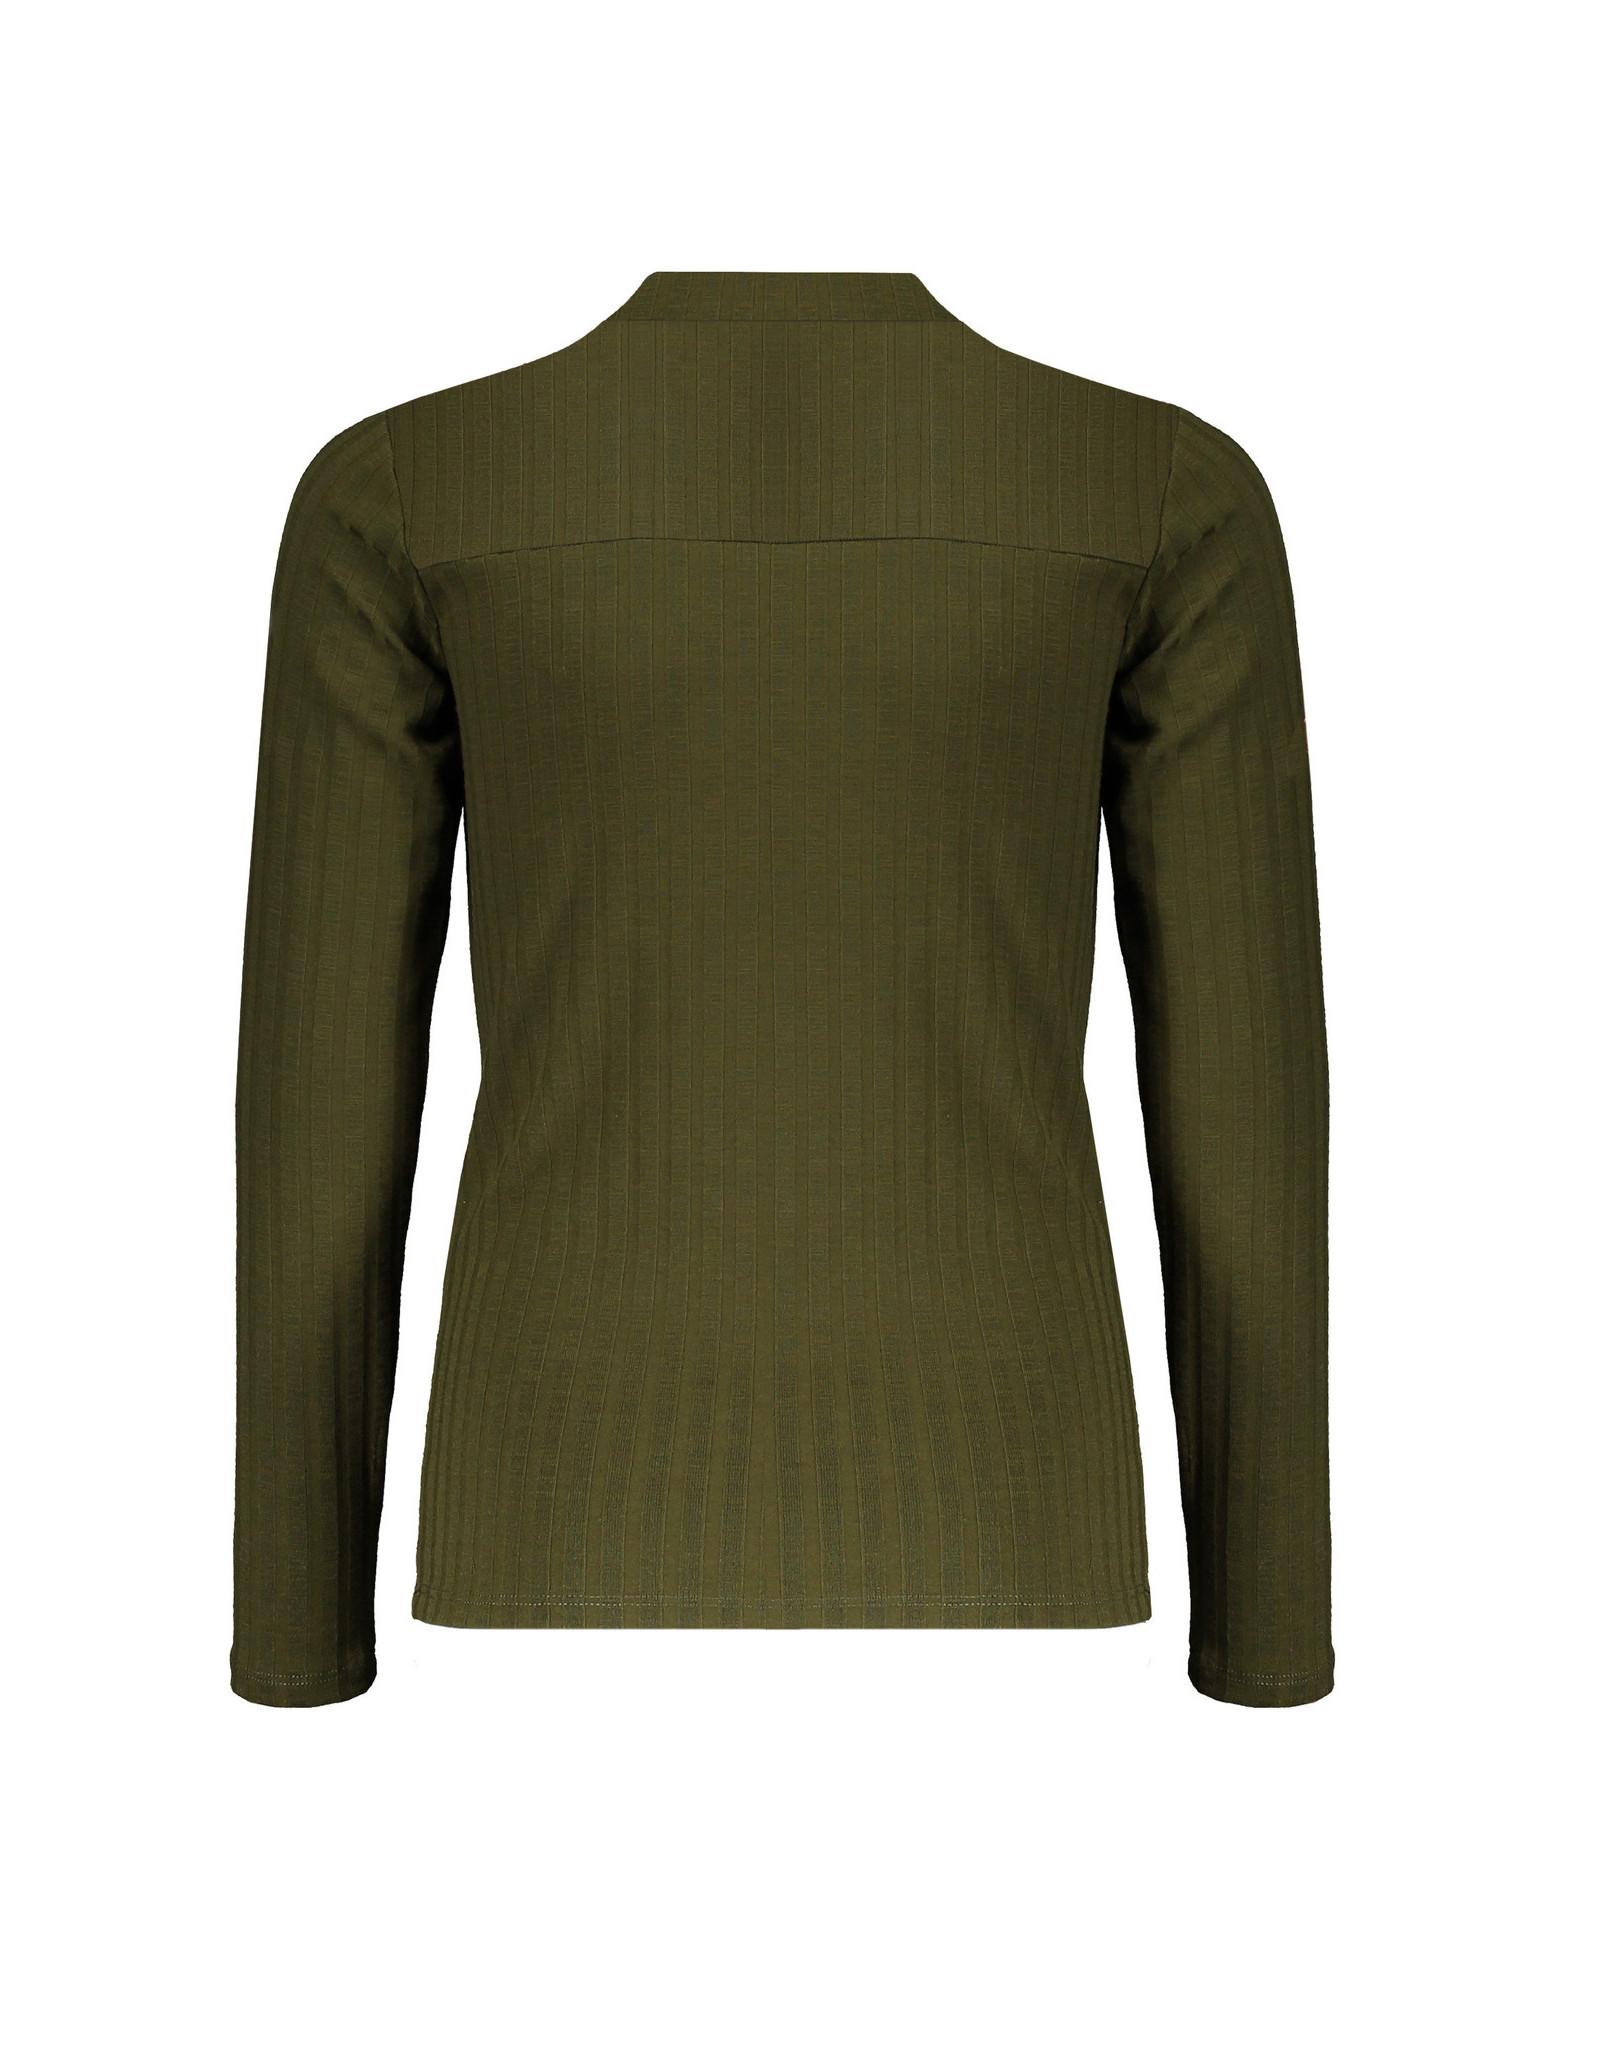 Nobell NoBell shirt 3401 army green